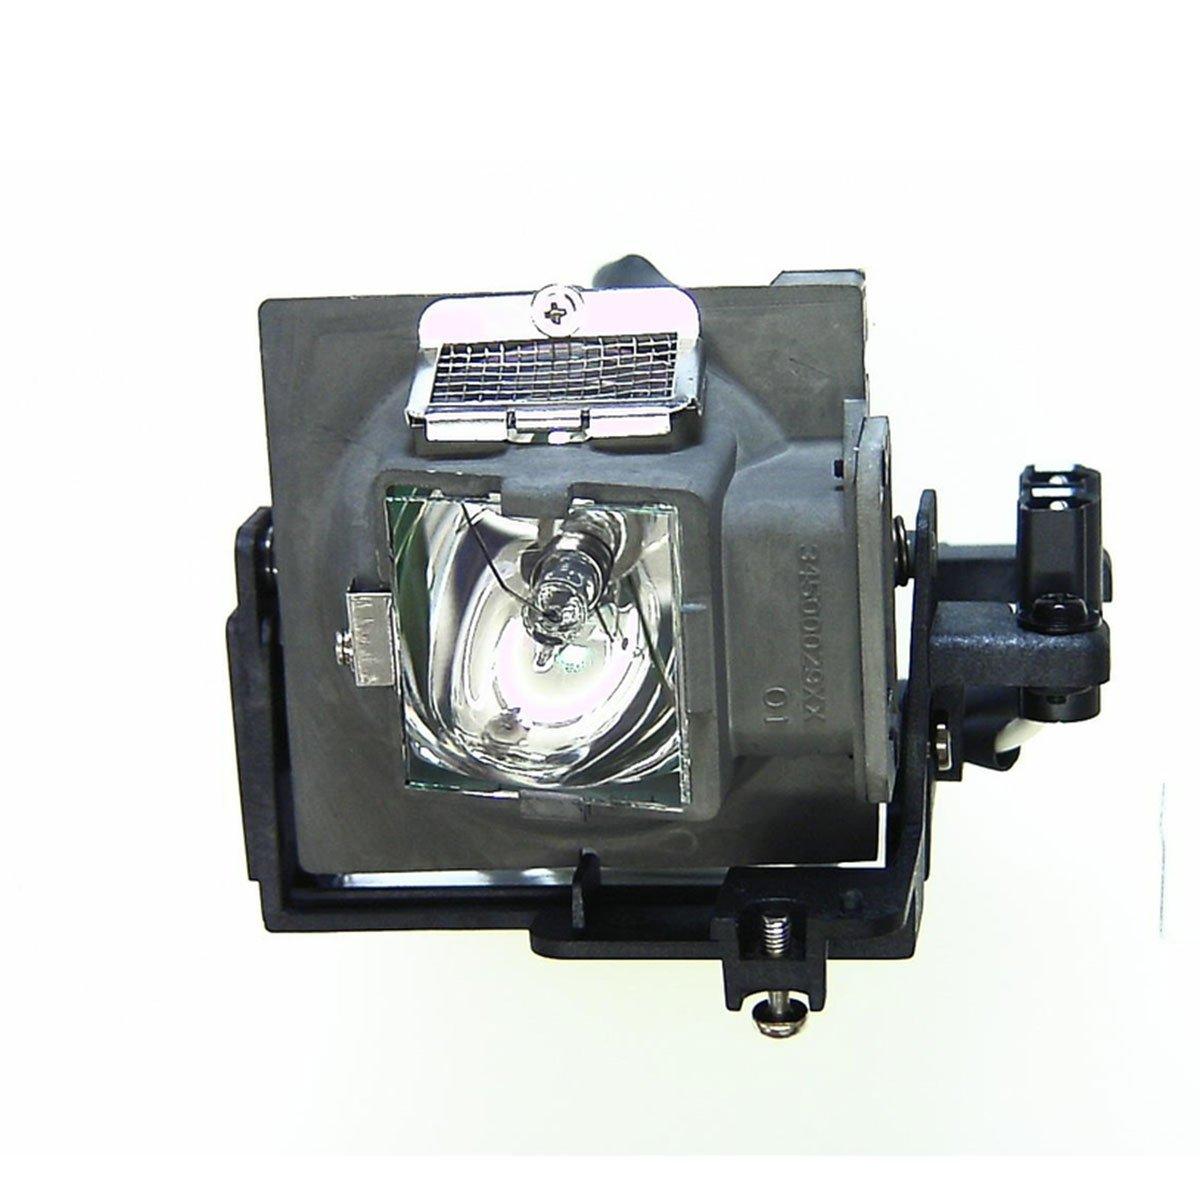 SpArc Platinum LG AL-JDT2 Projector Replacement Lamp with Housing